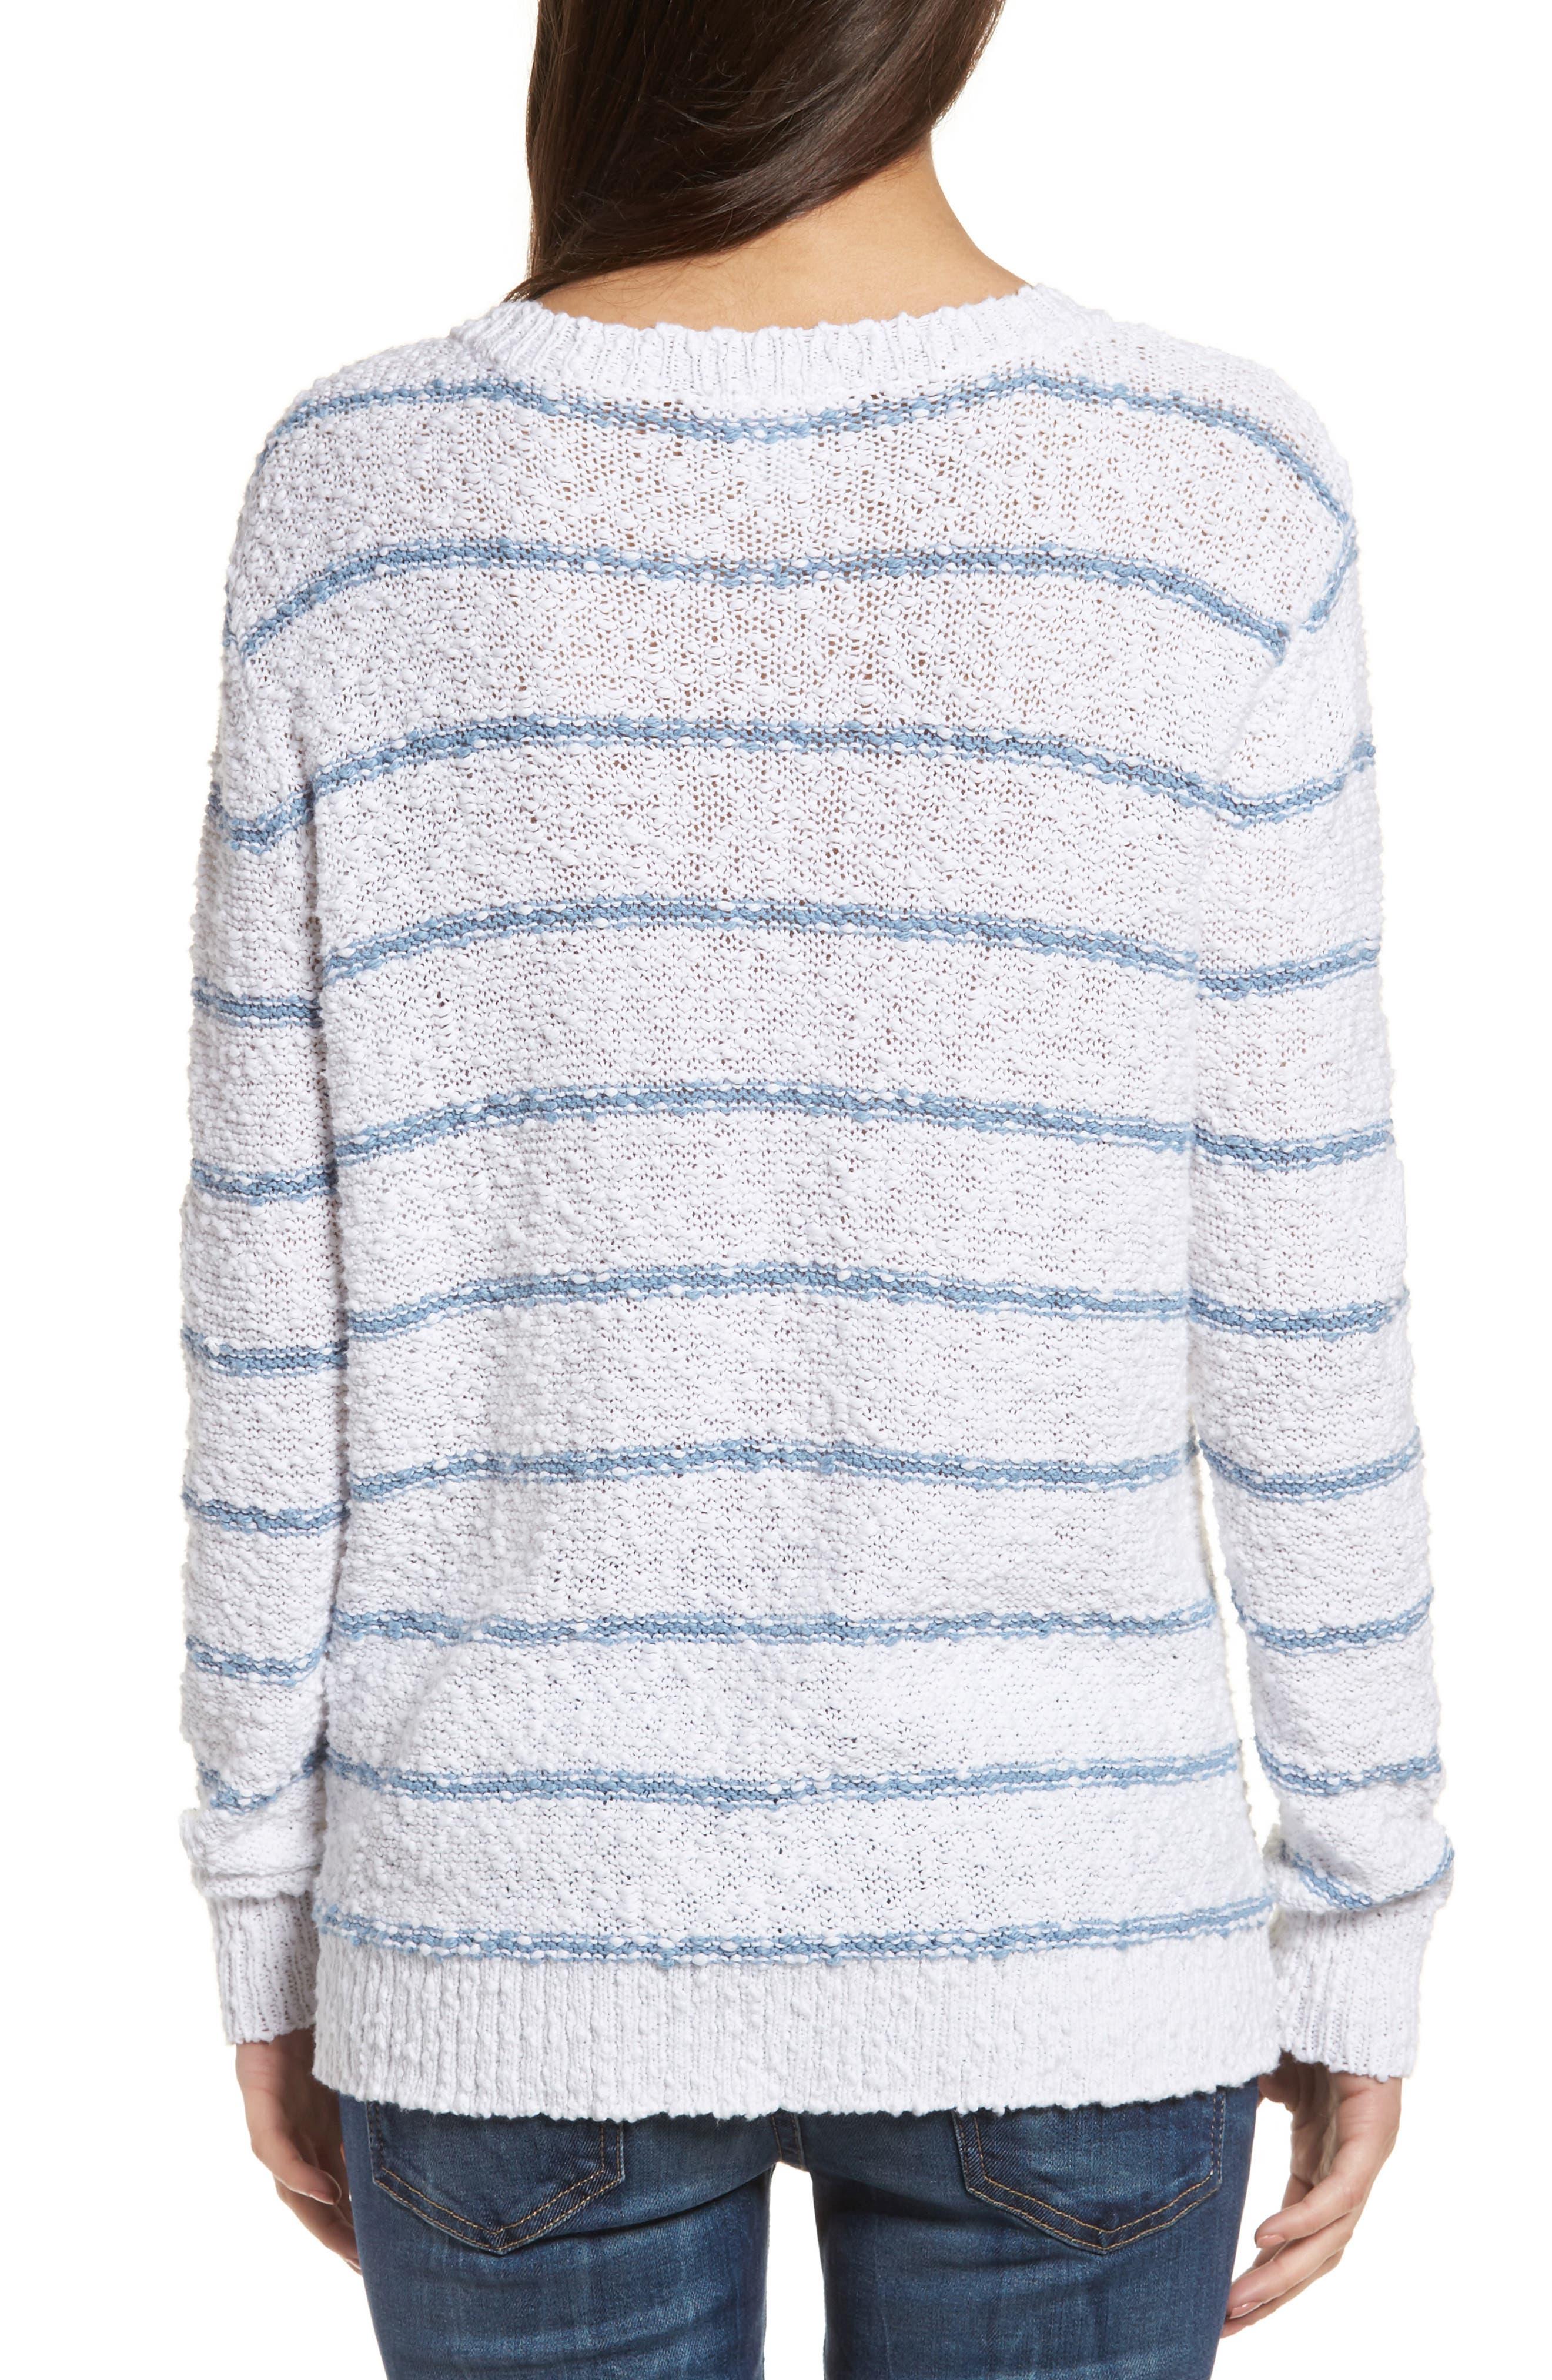 Laureen Sweater,                             Alternate thumbnail 2, color,                             160